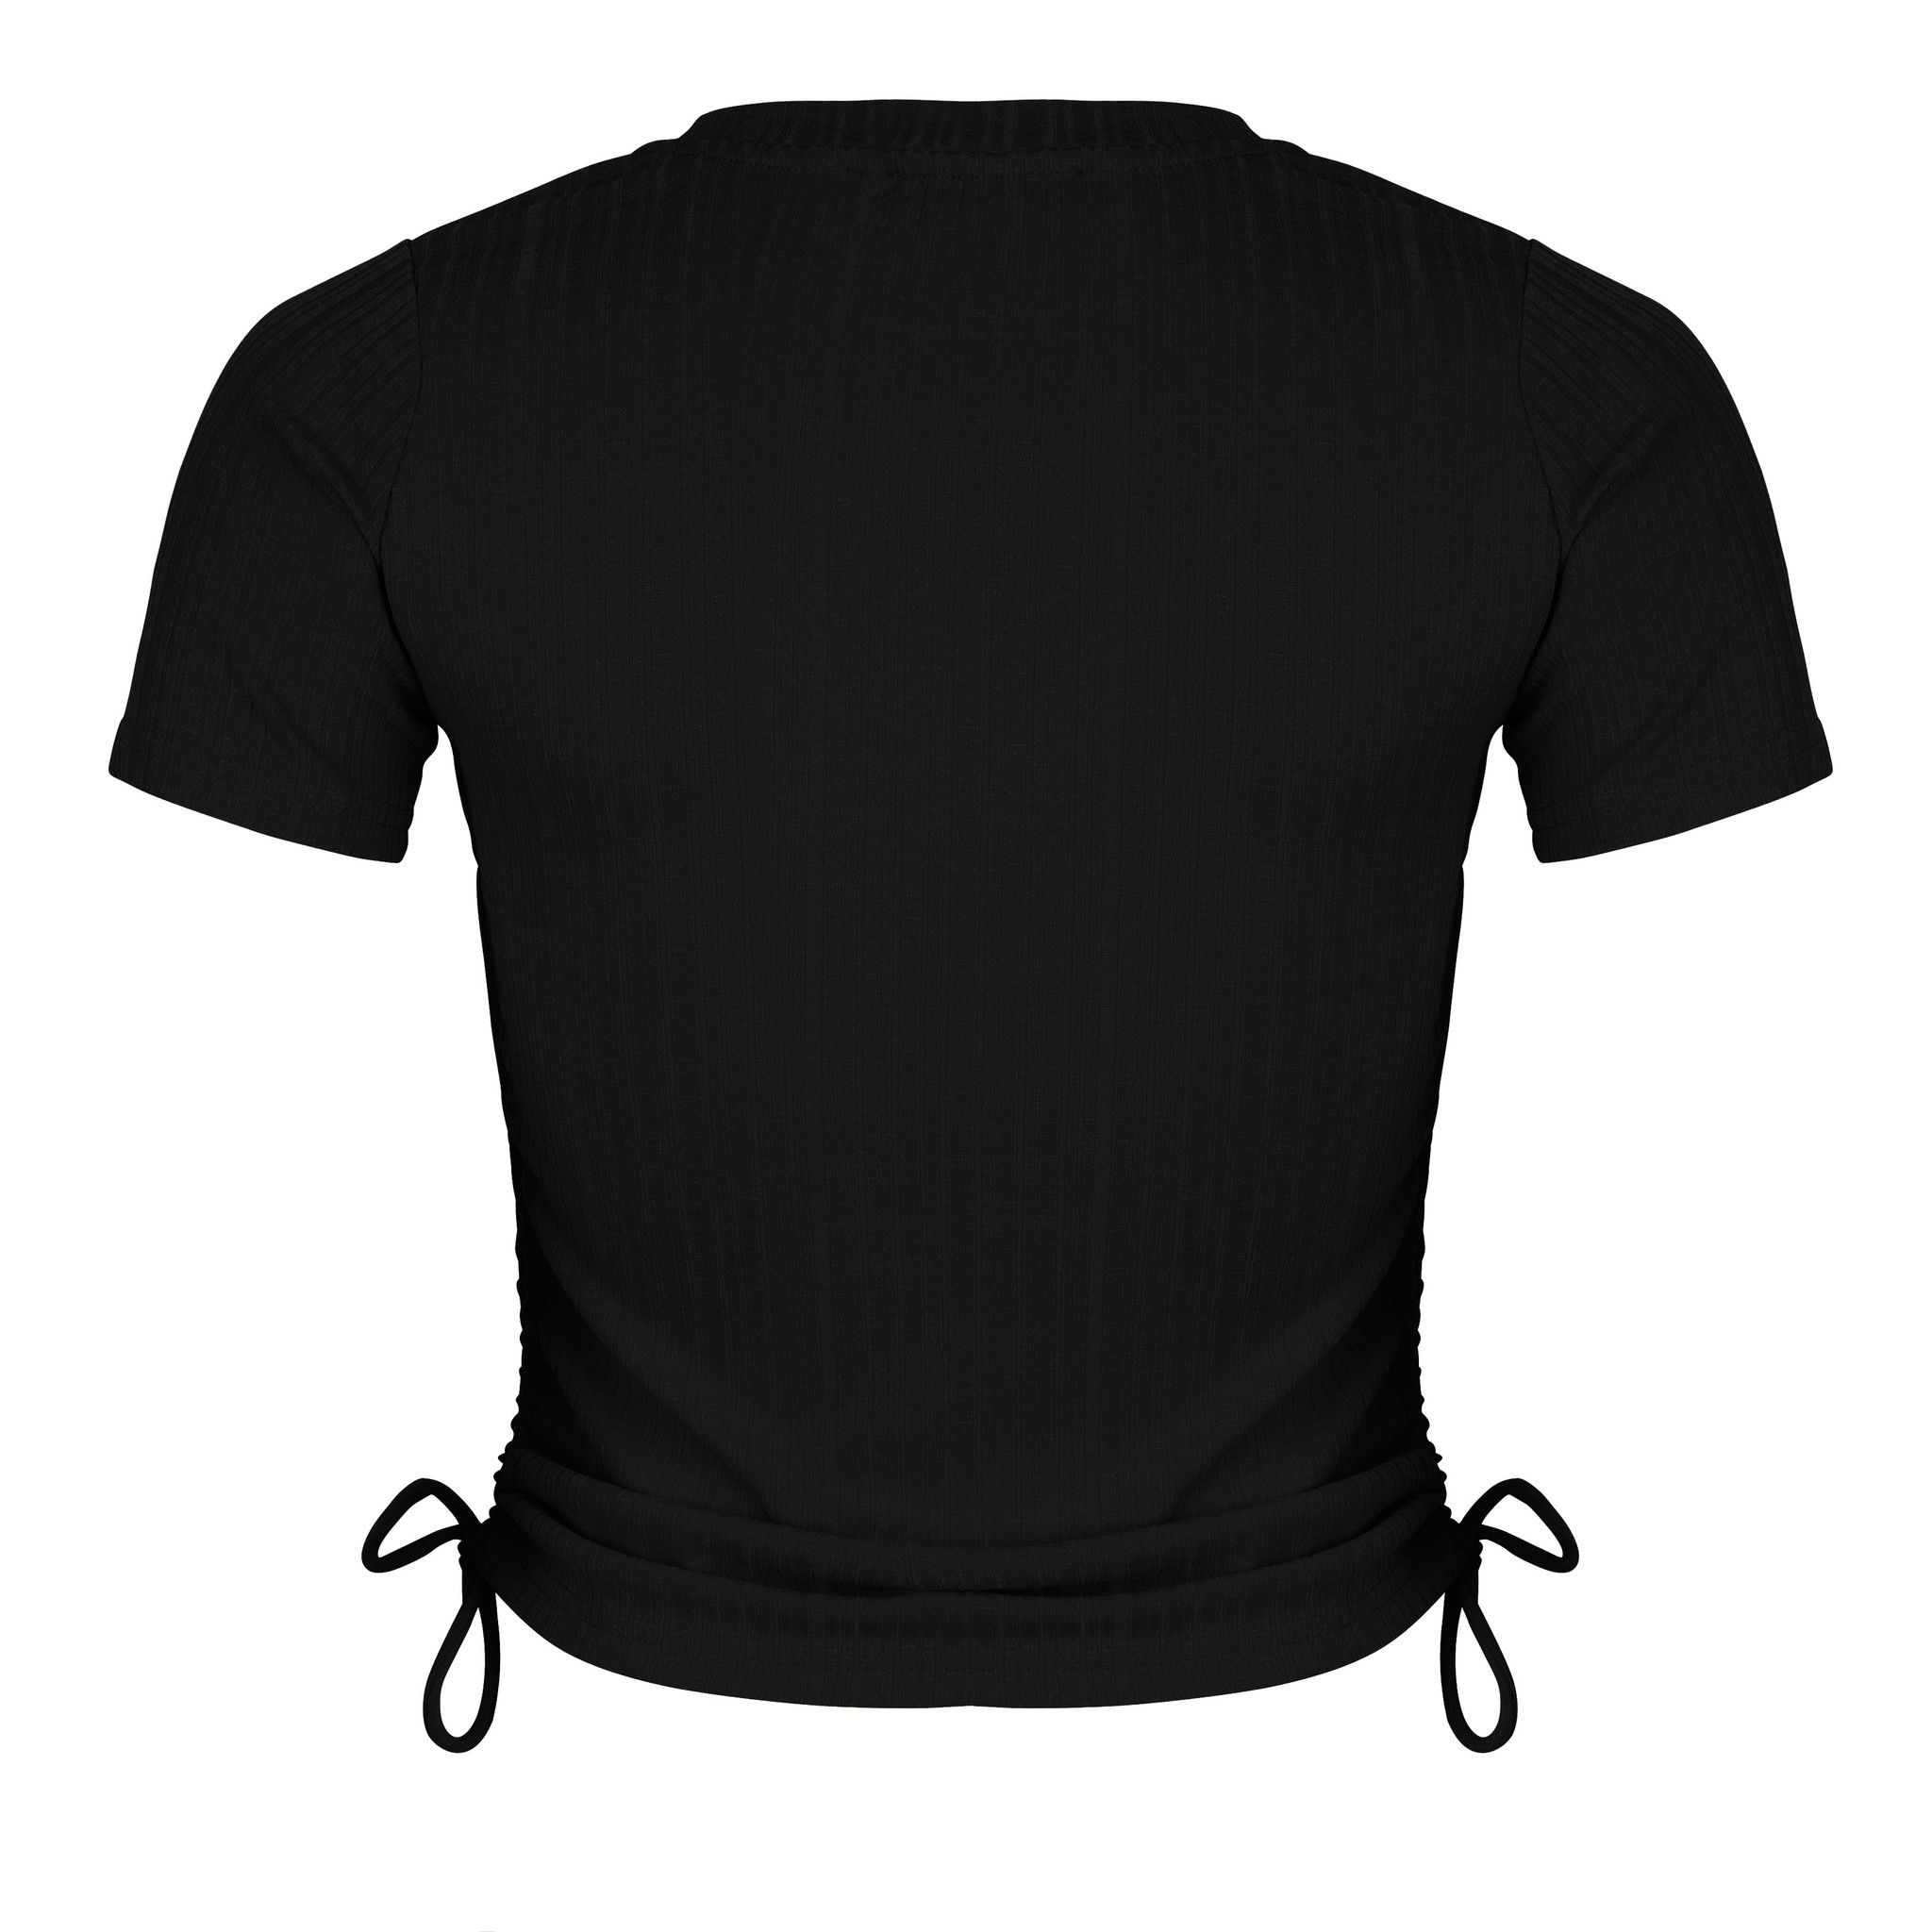 Lofty Manner Black Top Danae